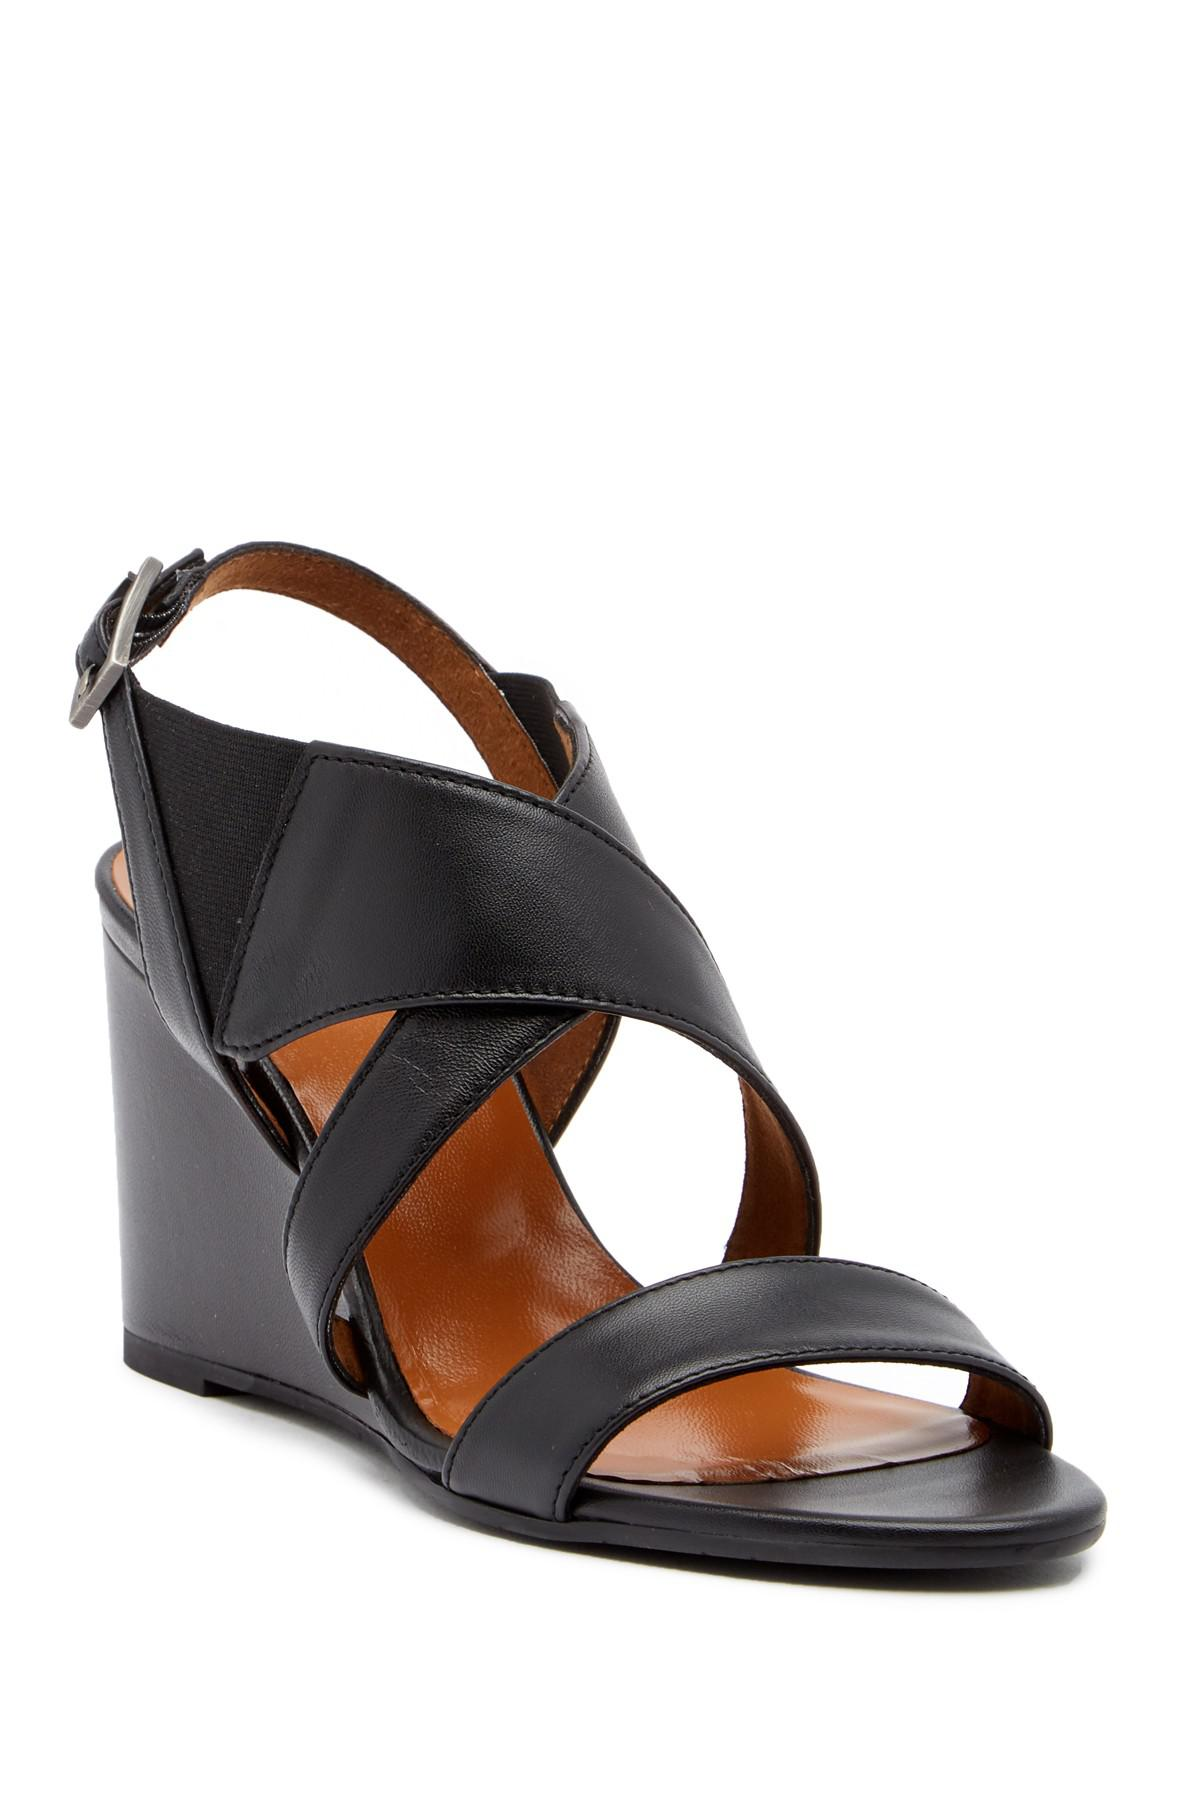 Aquatalia Nikki Slingback Wedge Sandal VRY8YTXs